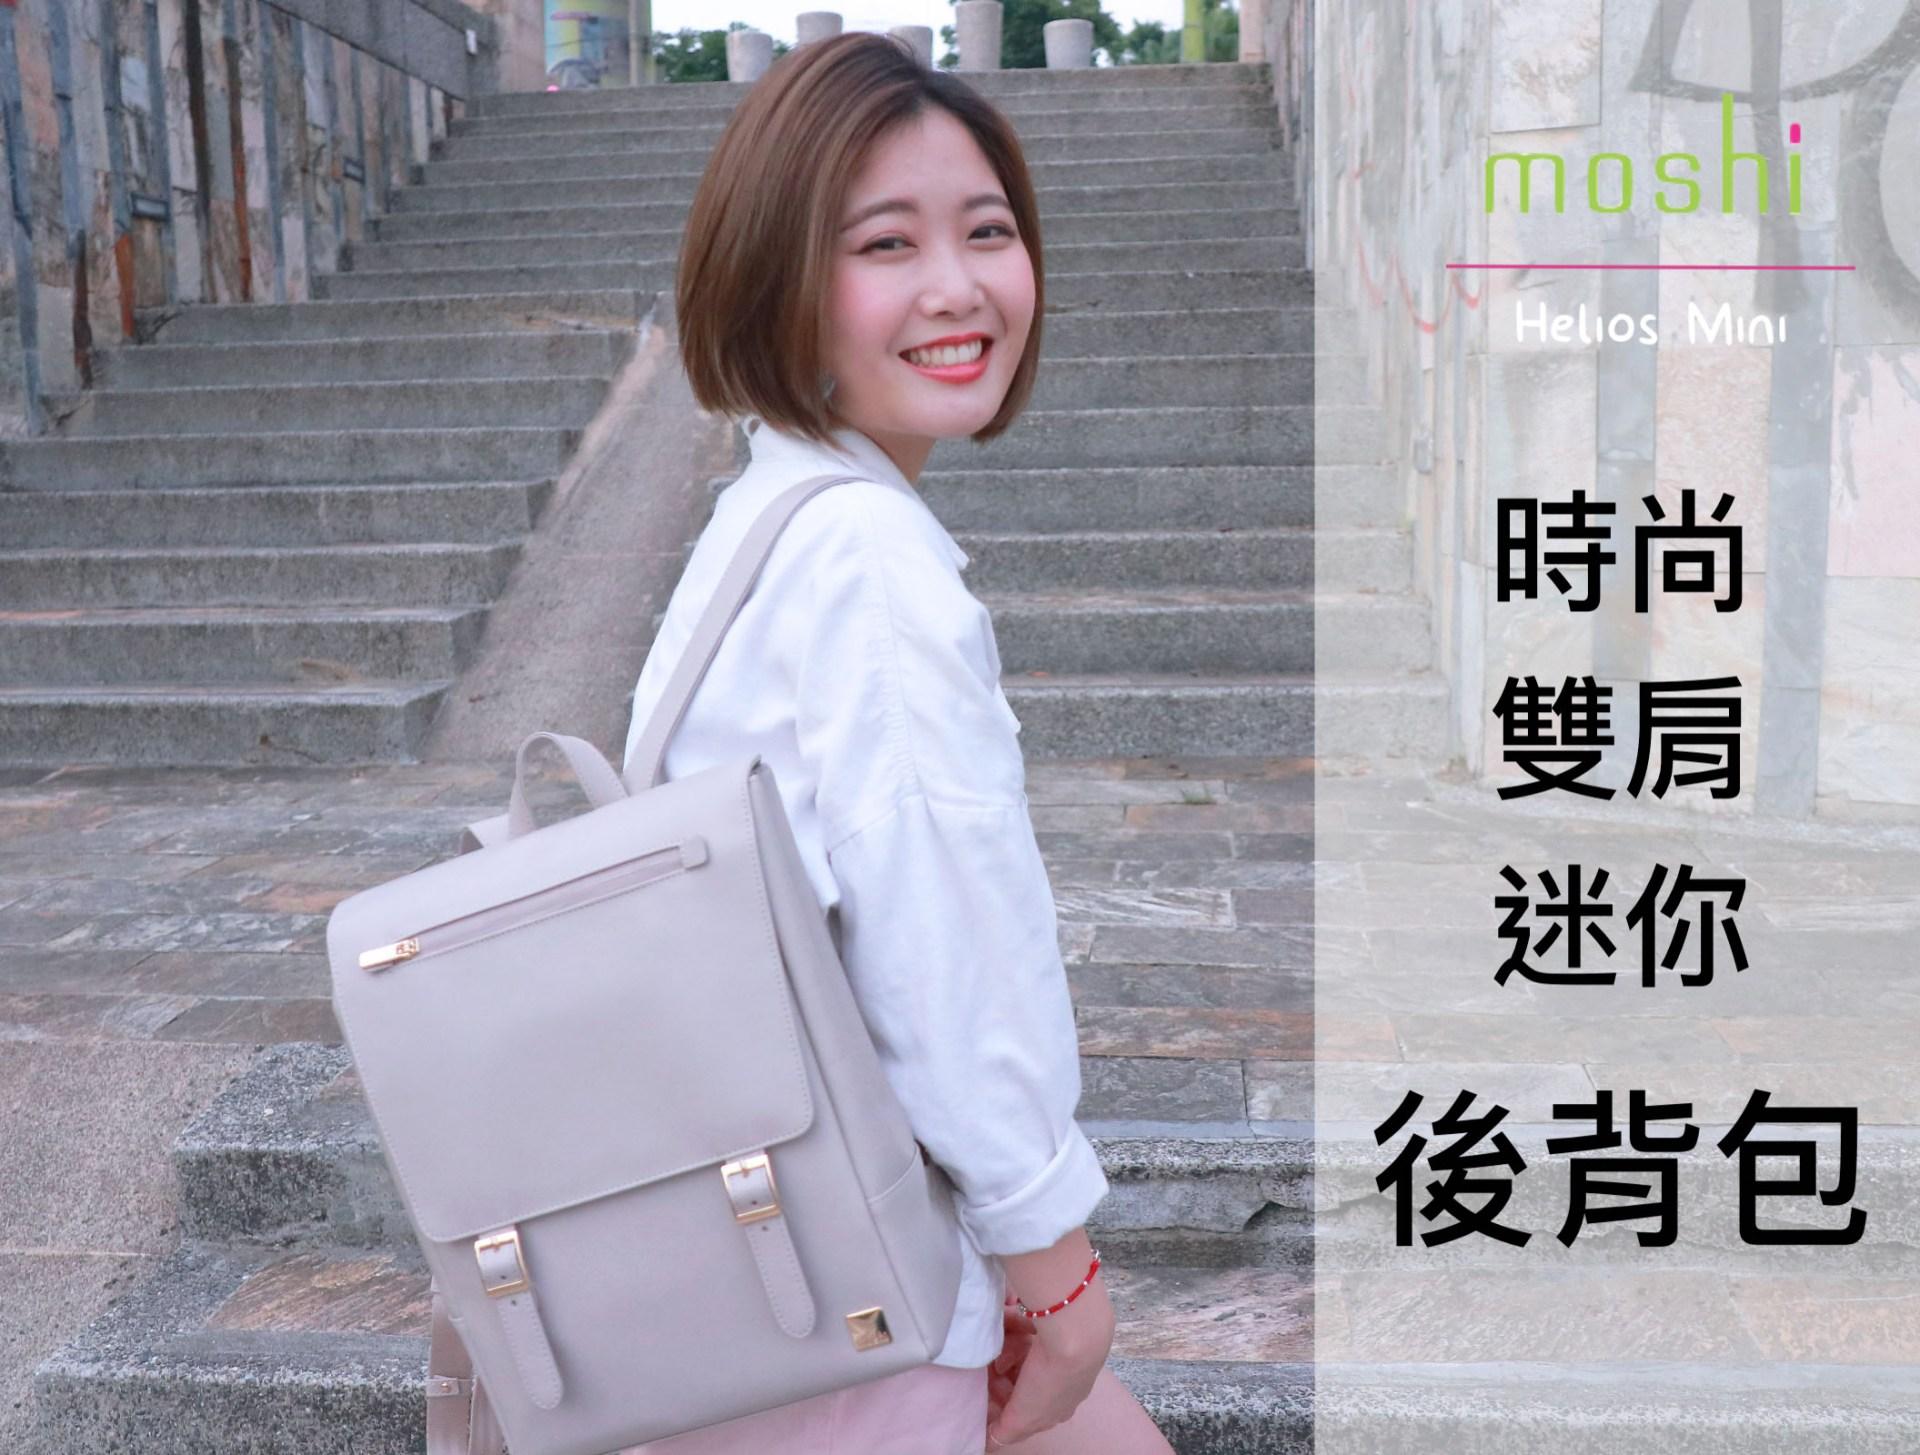 moshi helios mini 時尚雙肩迷你後背包 12